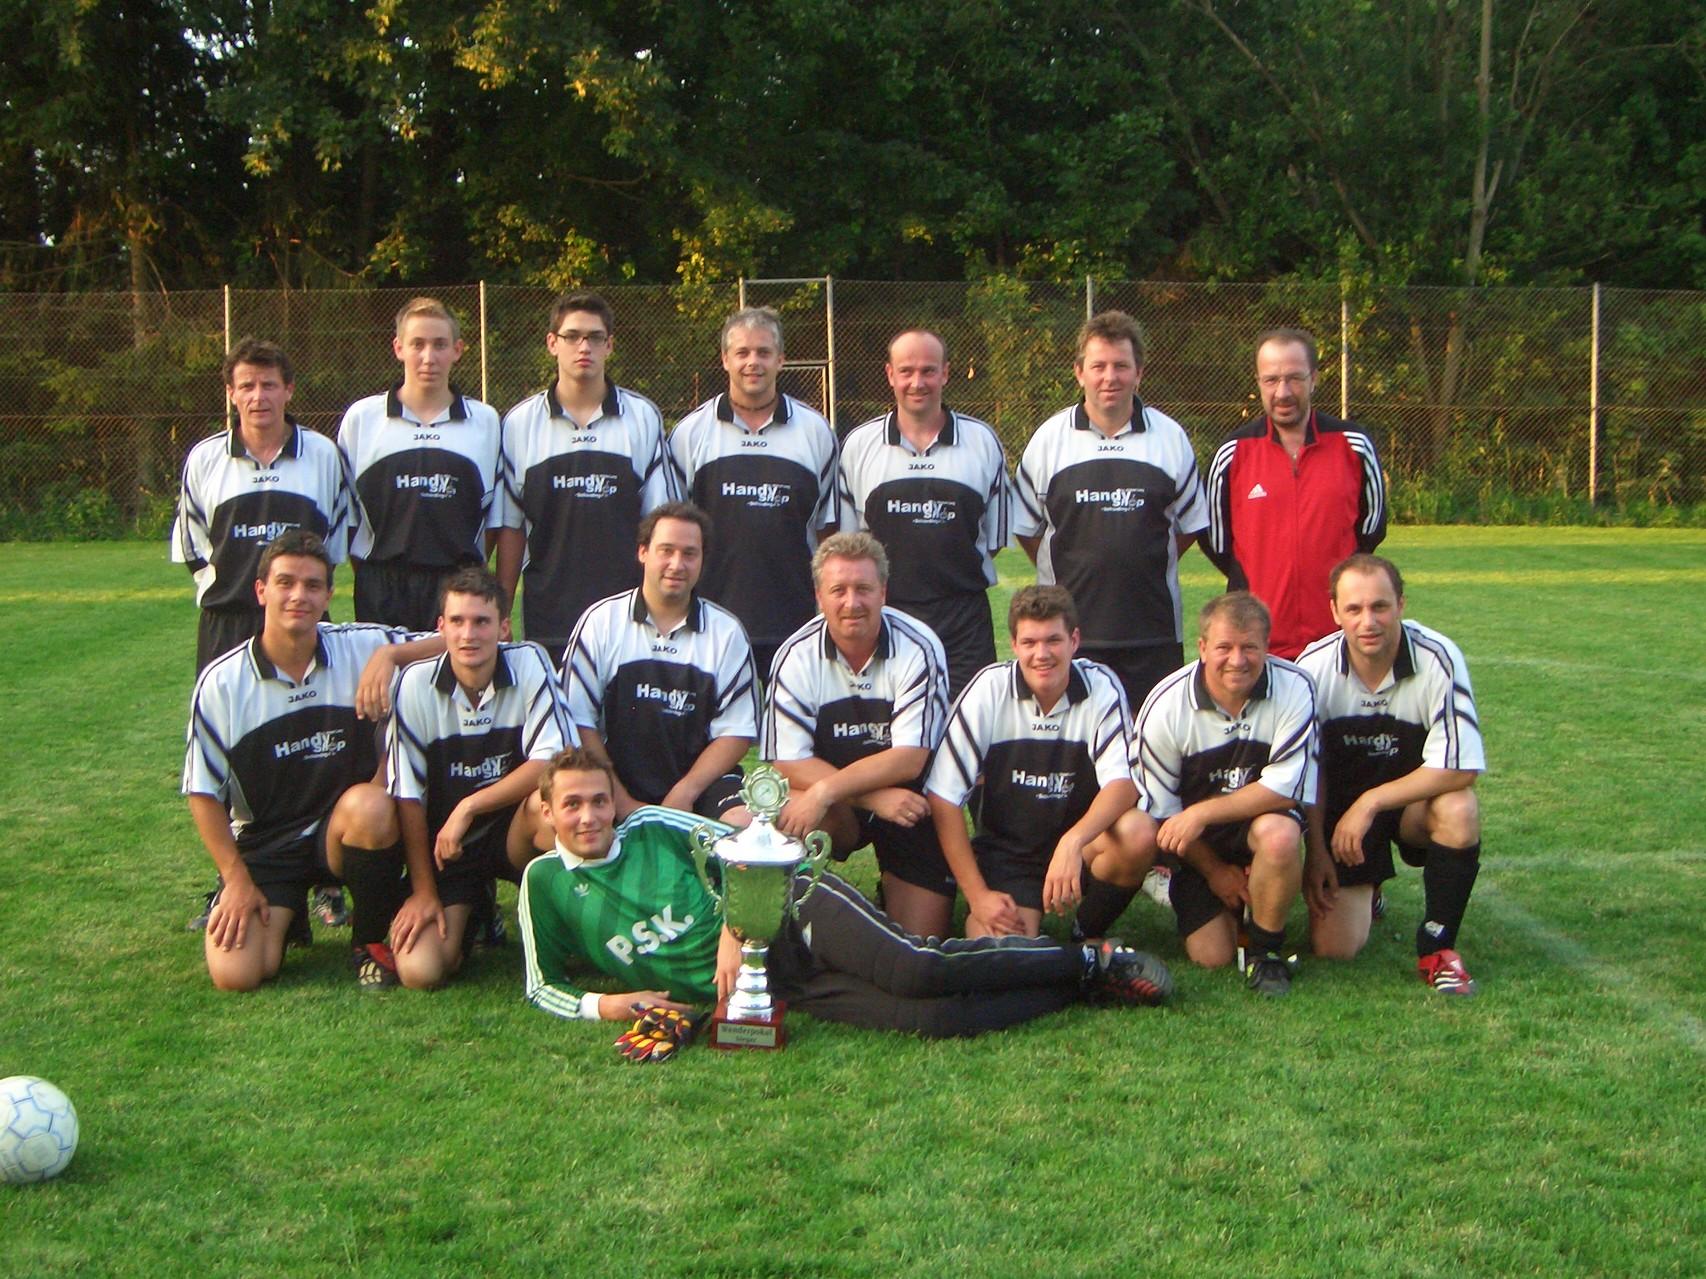 Champion 2007 - Union Brunnenthal